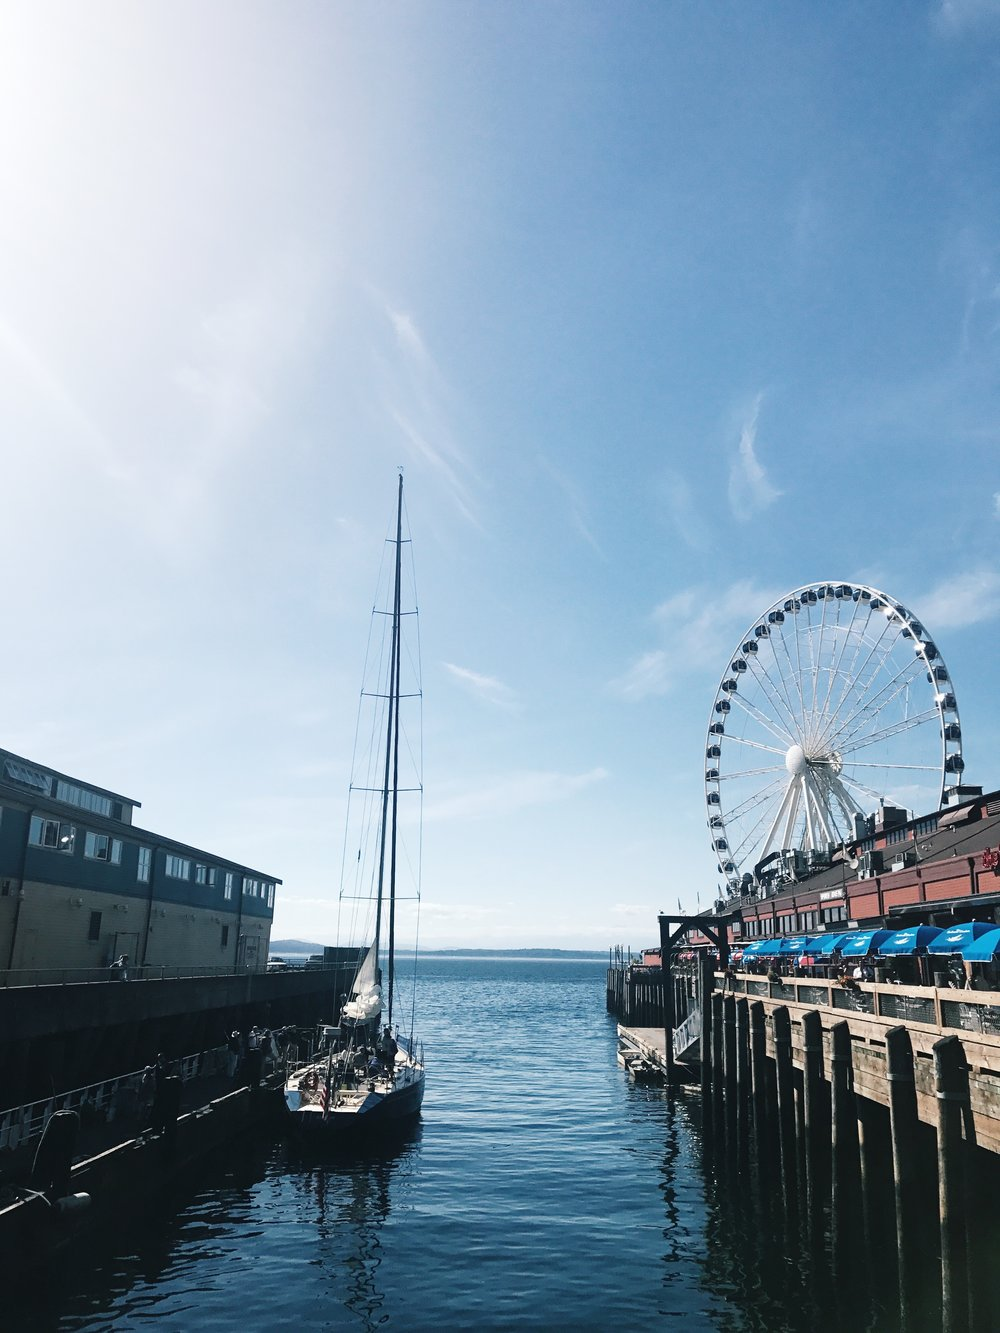 Seattle Elliot Bay Waterfront Puget Sound Sailing Ferris Wheel